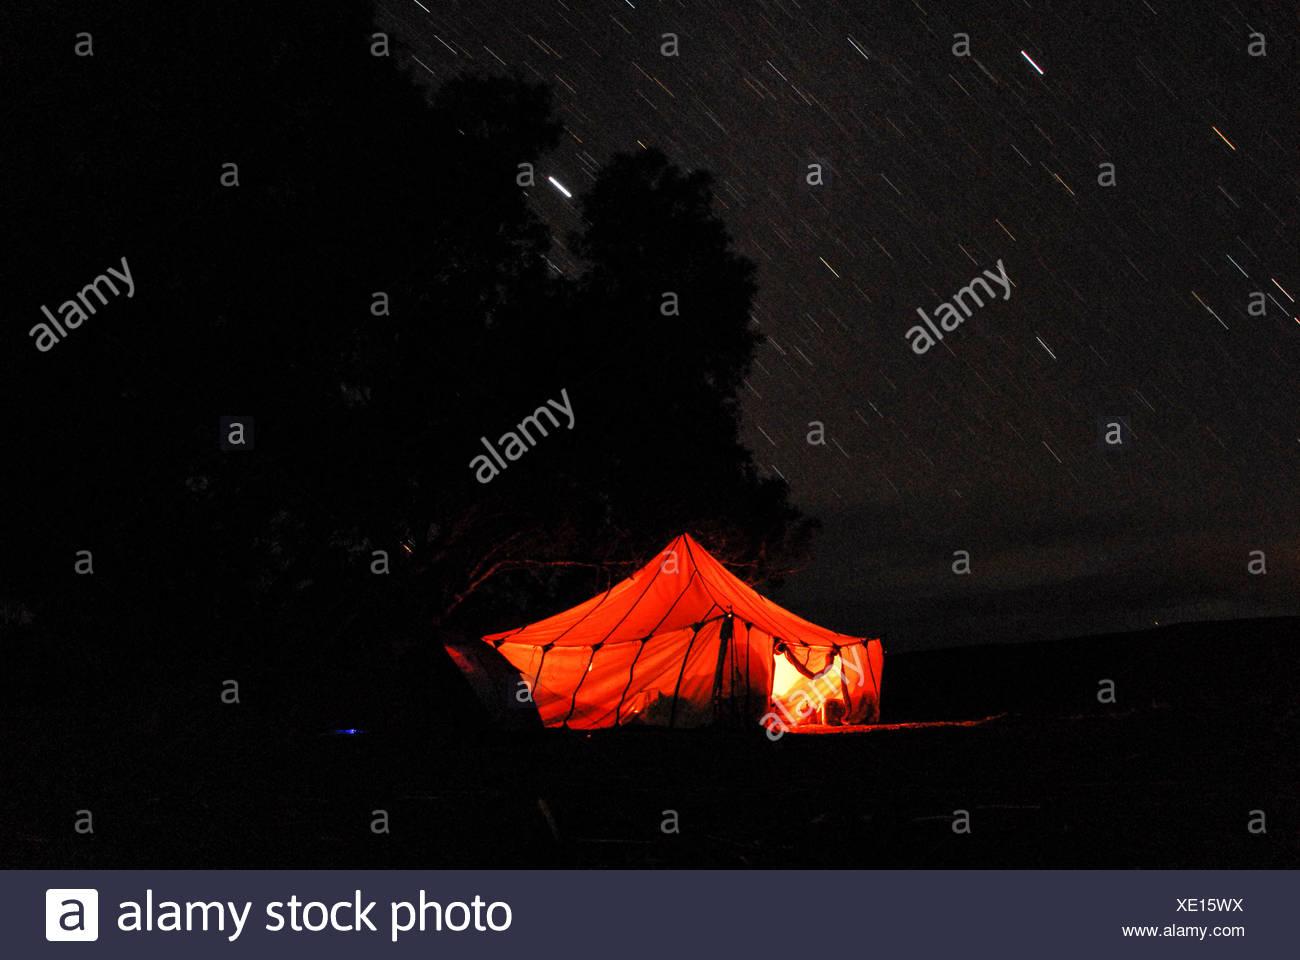 Berber tent , at nighttime, in the Sahara desert - Stock Image